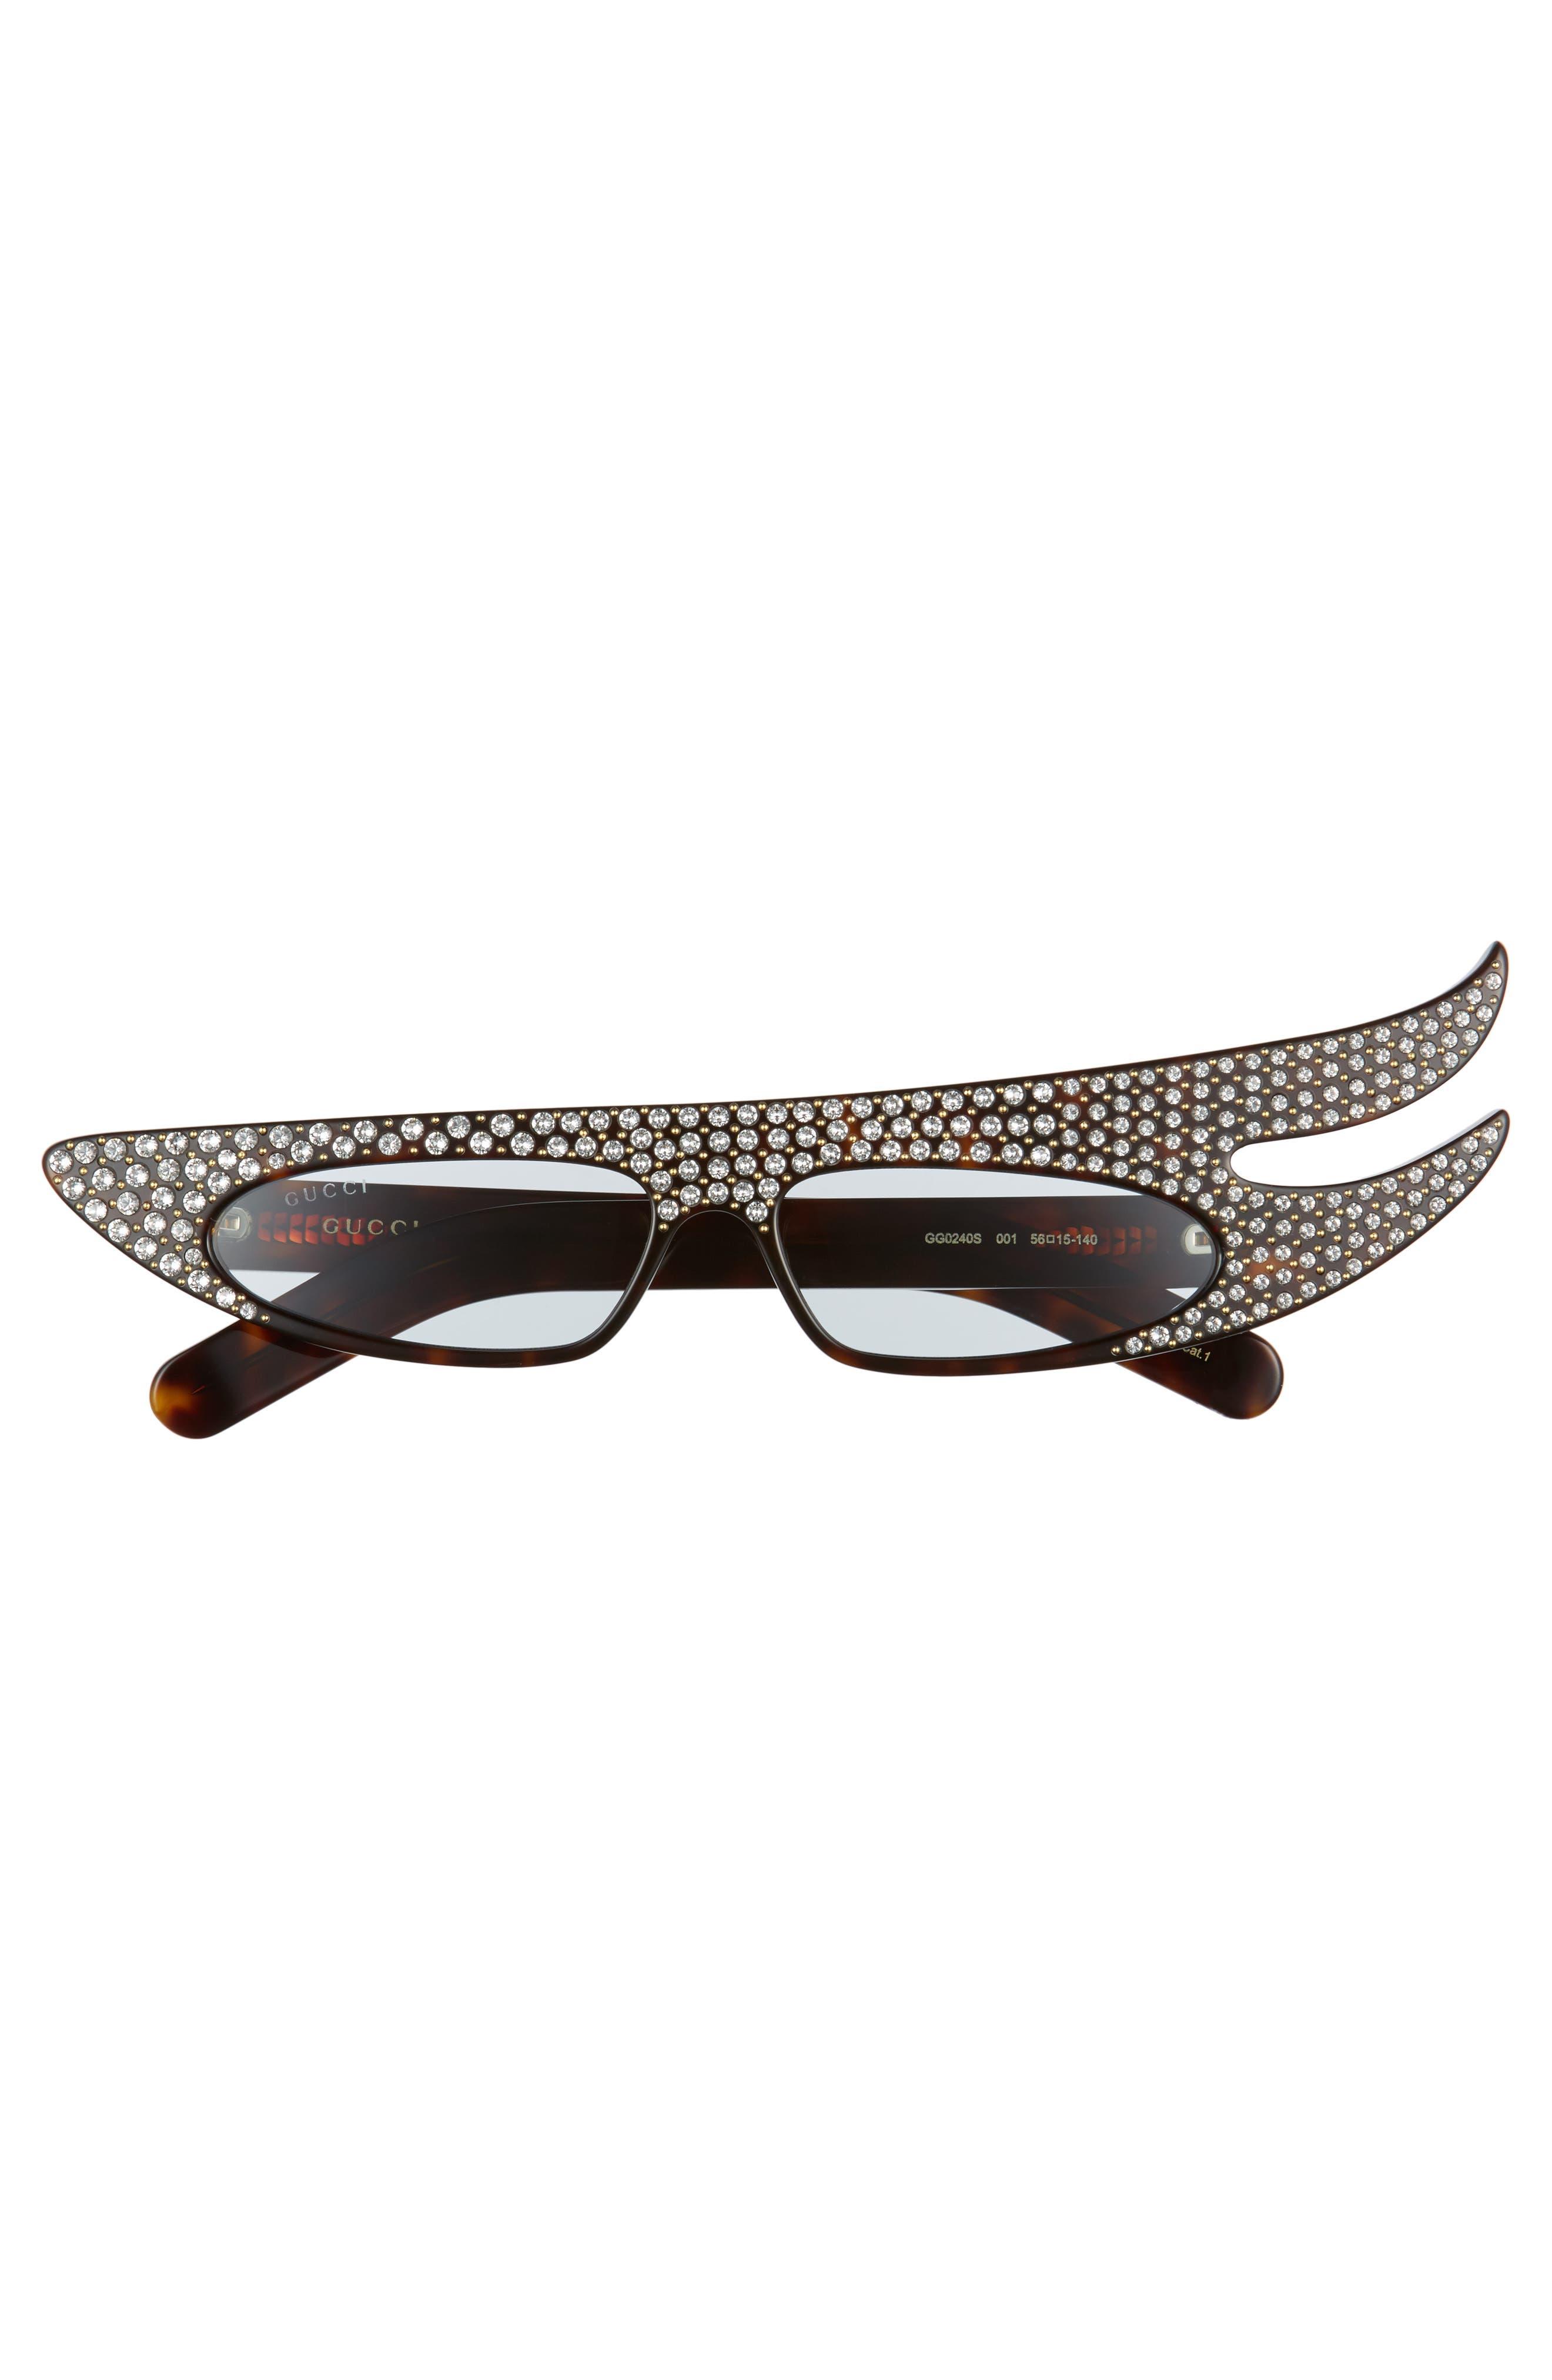 56mm Embellished Statement Sunglasses,                             Alternate thumbnail 3, color,                             HAVANA